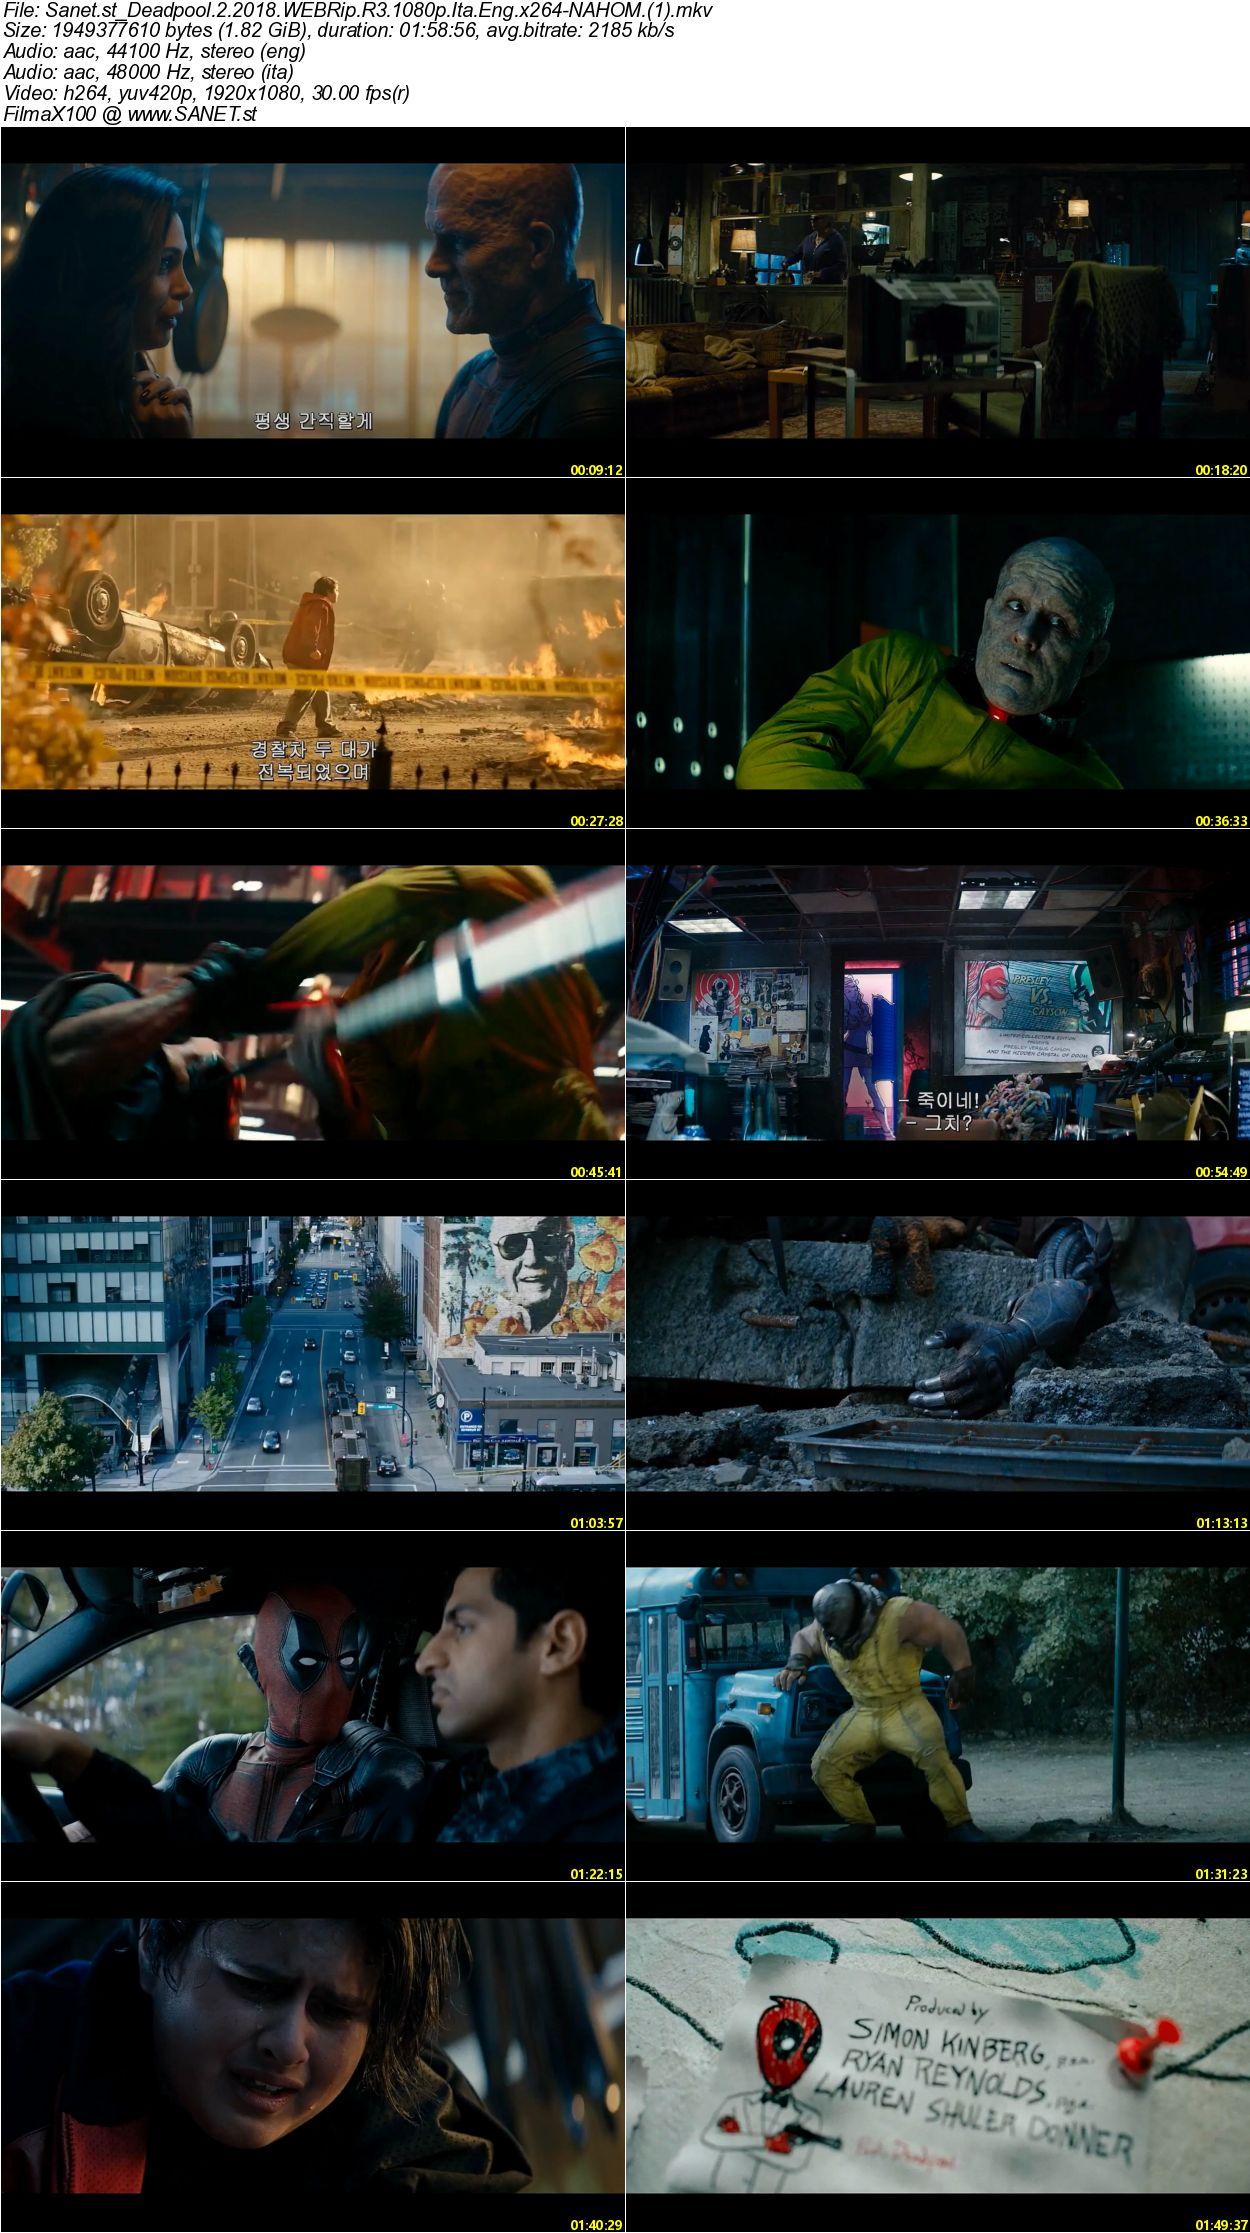 Download deadpool 2 2018 webrip r3 1080p ita eng x264 - Deadpool download 1080p ...